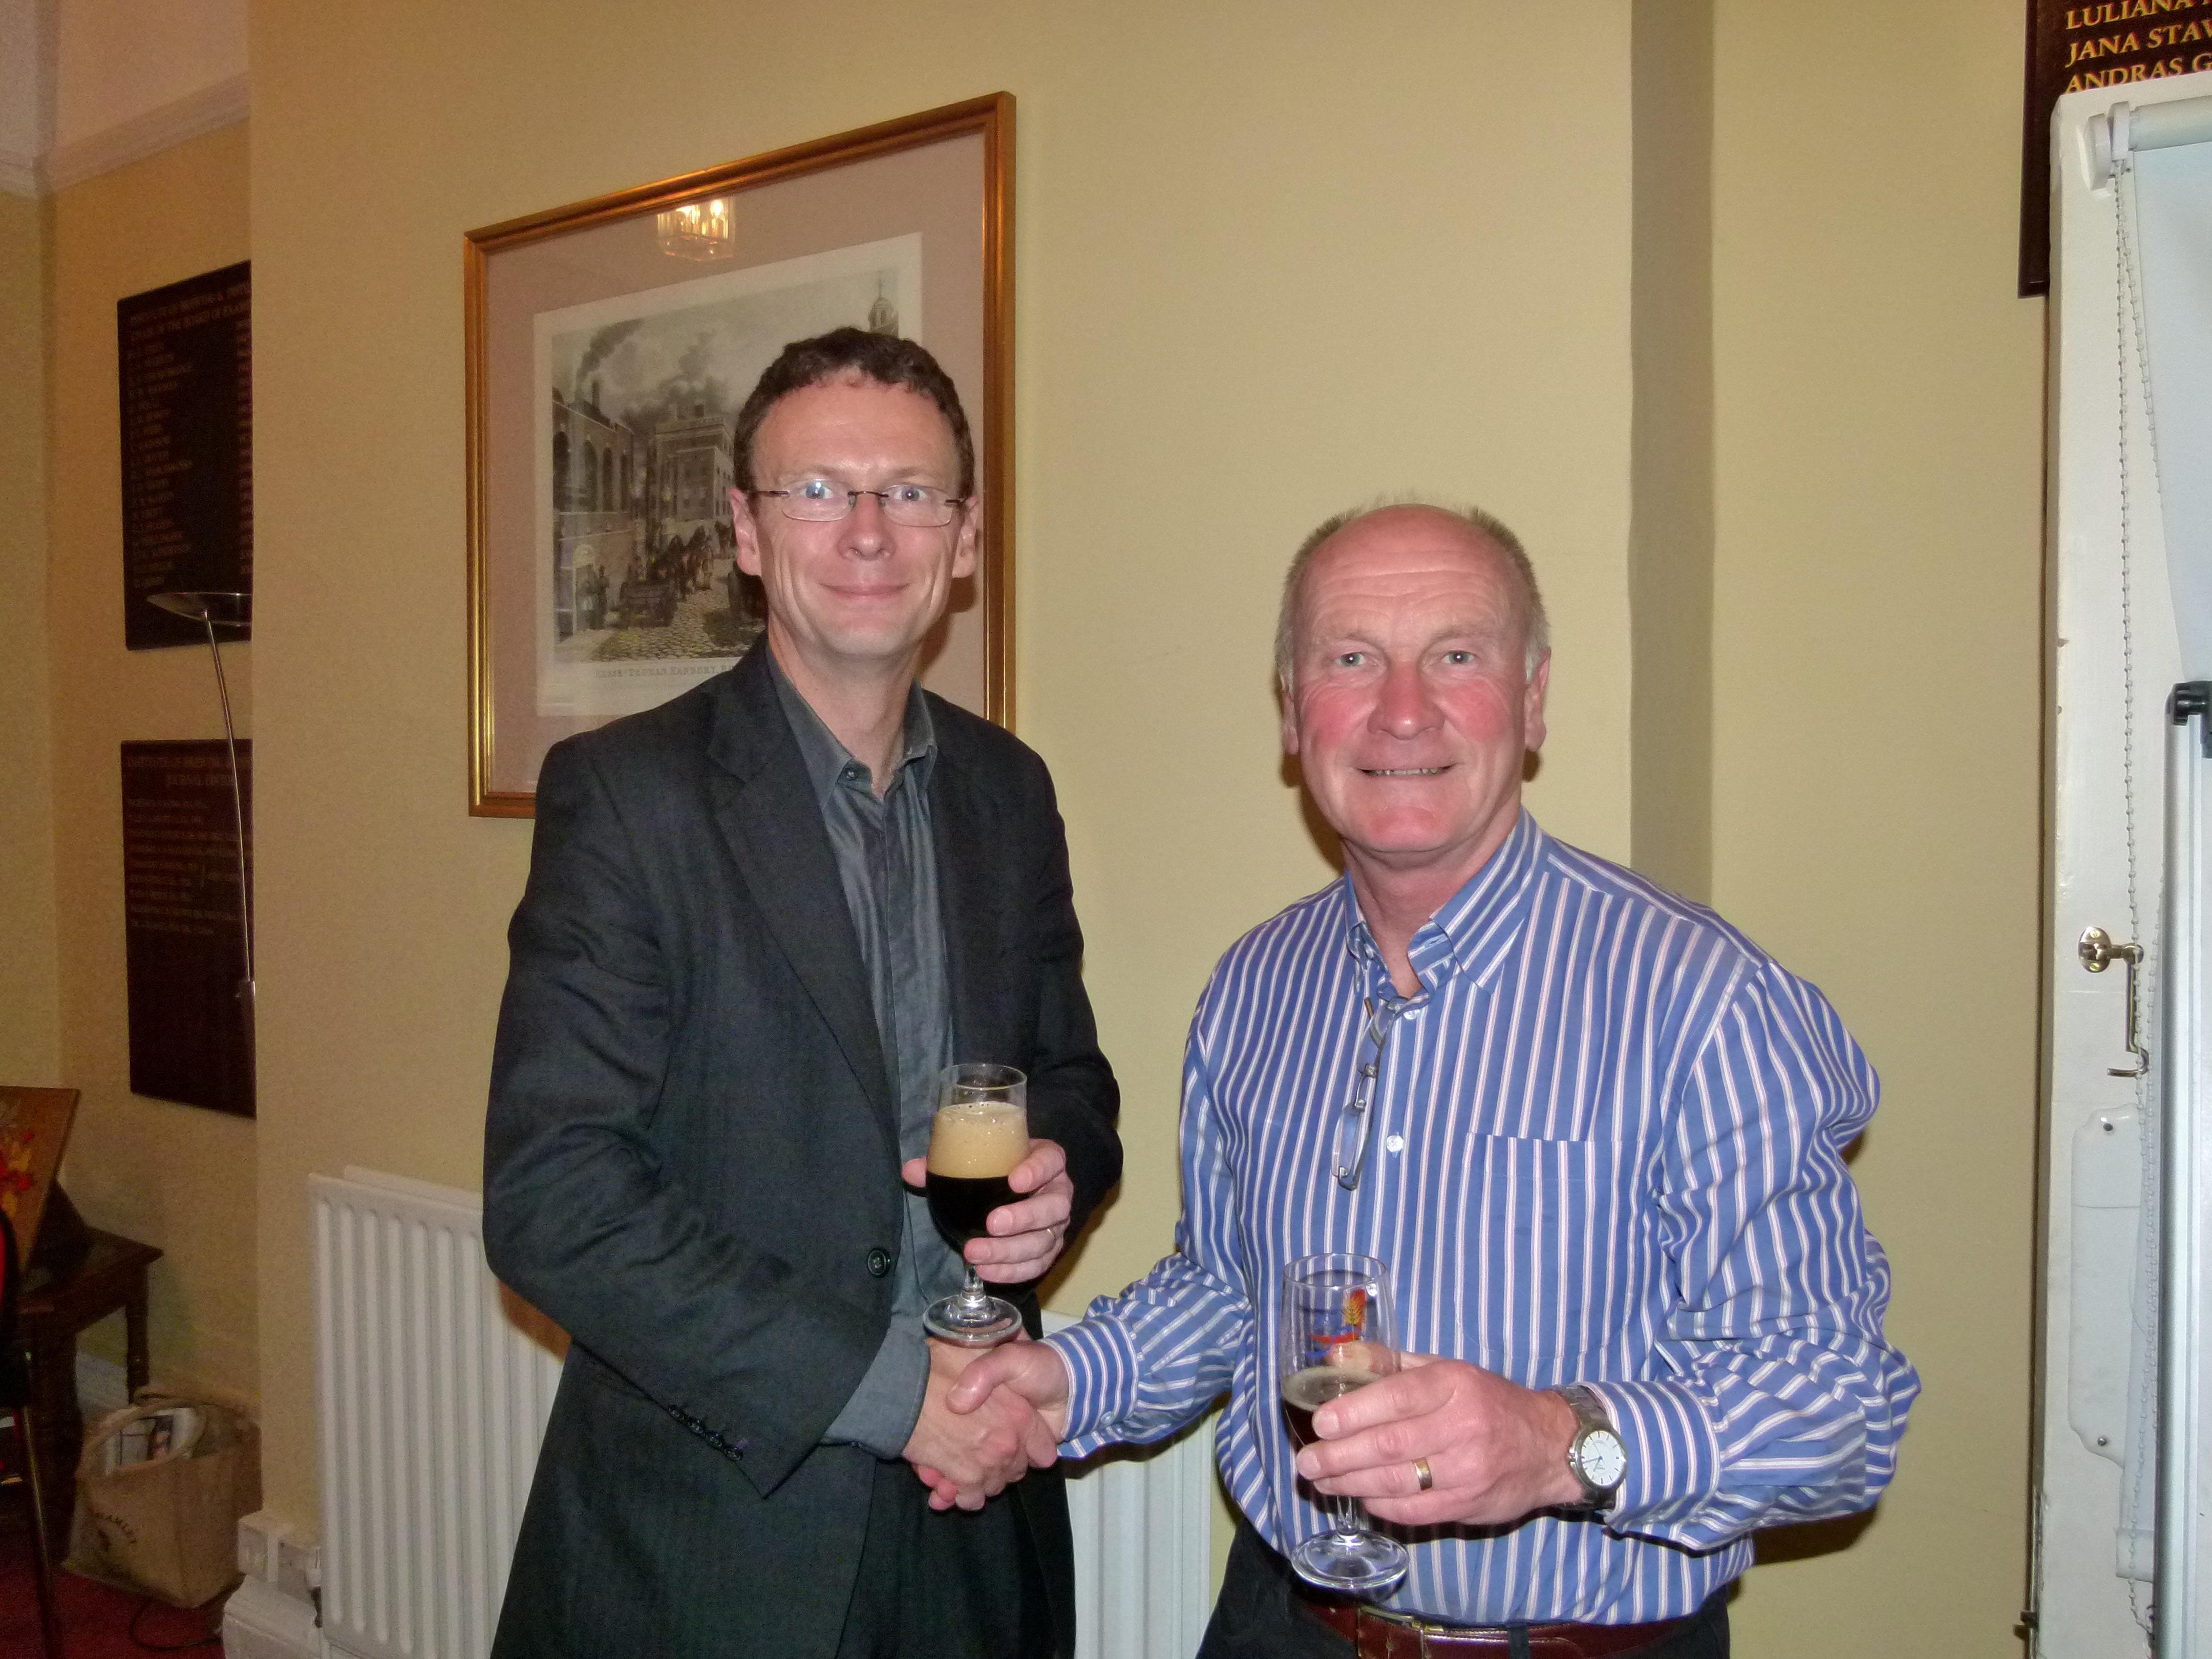 Tim Britton, Grantham, England<br>Accredited: 4th July 2013